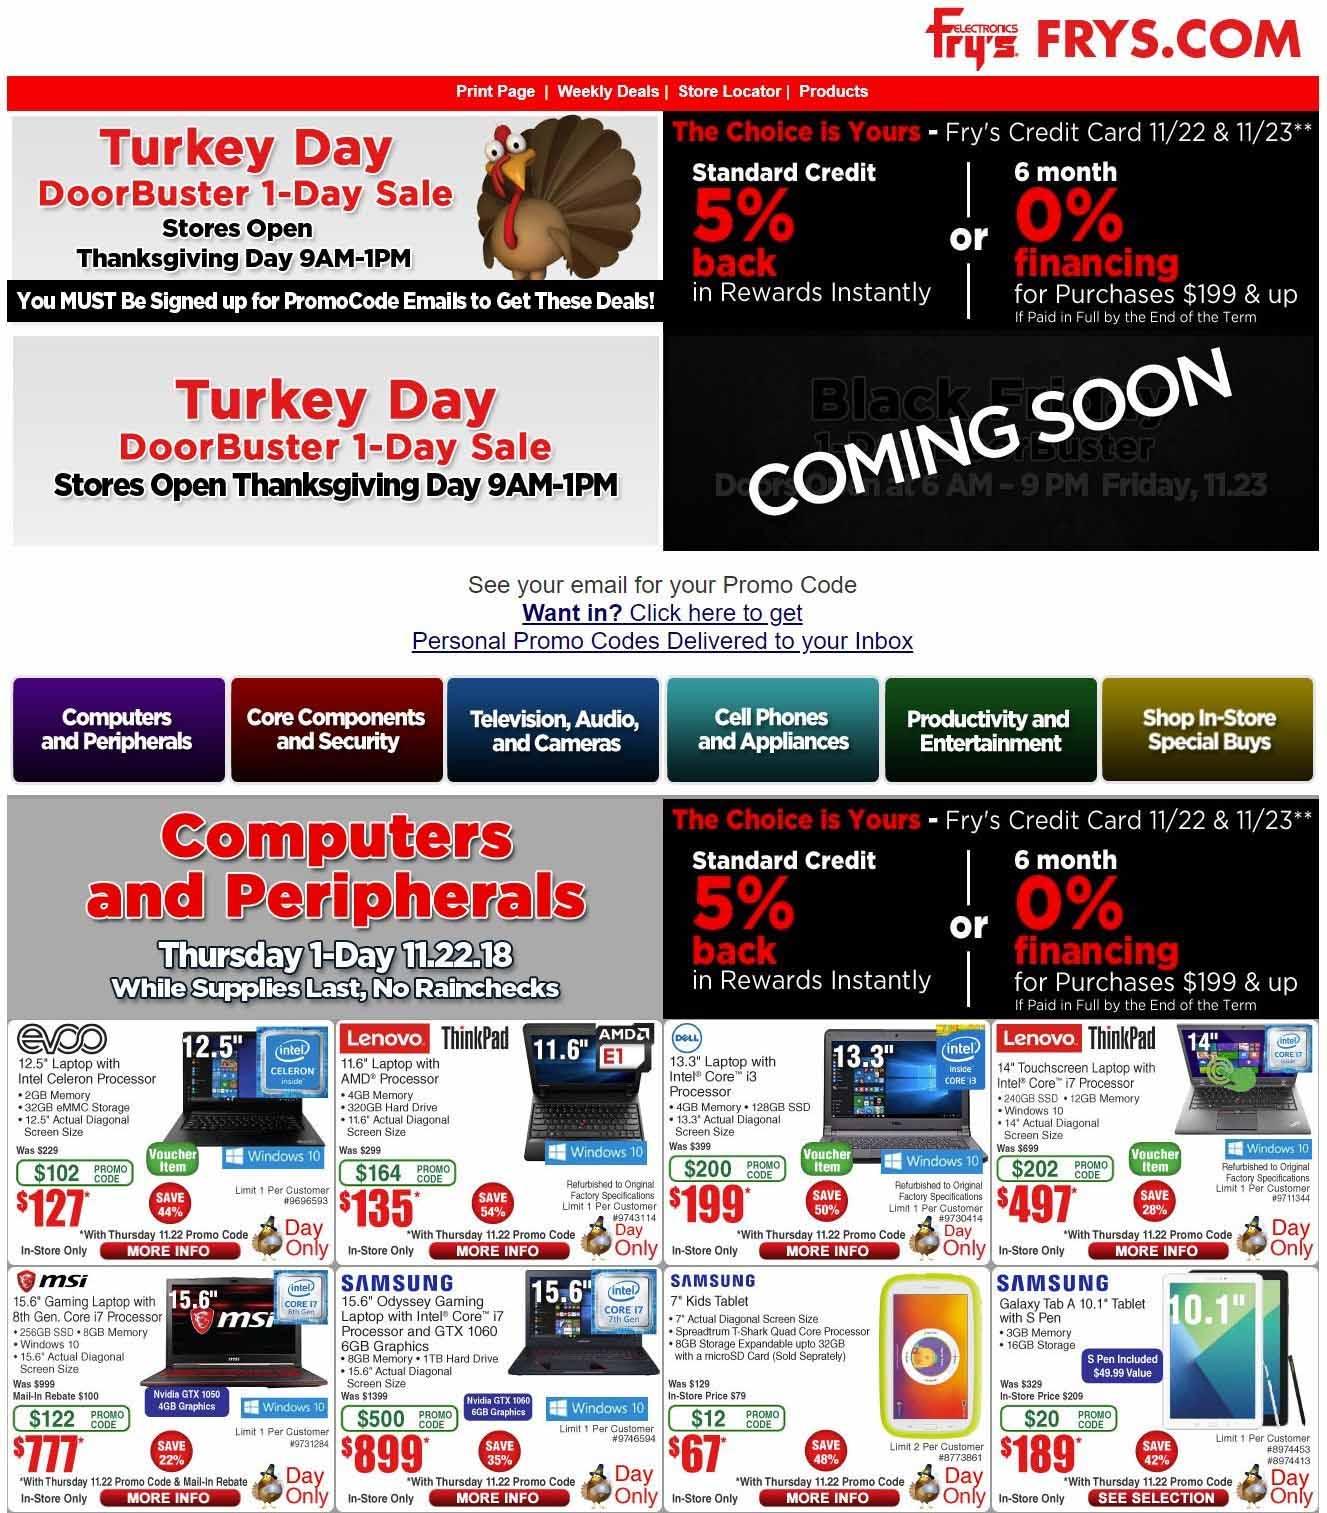 Frys's Black Friday Flyers & Ad Scans - Desktop PC,Dell XPS